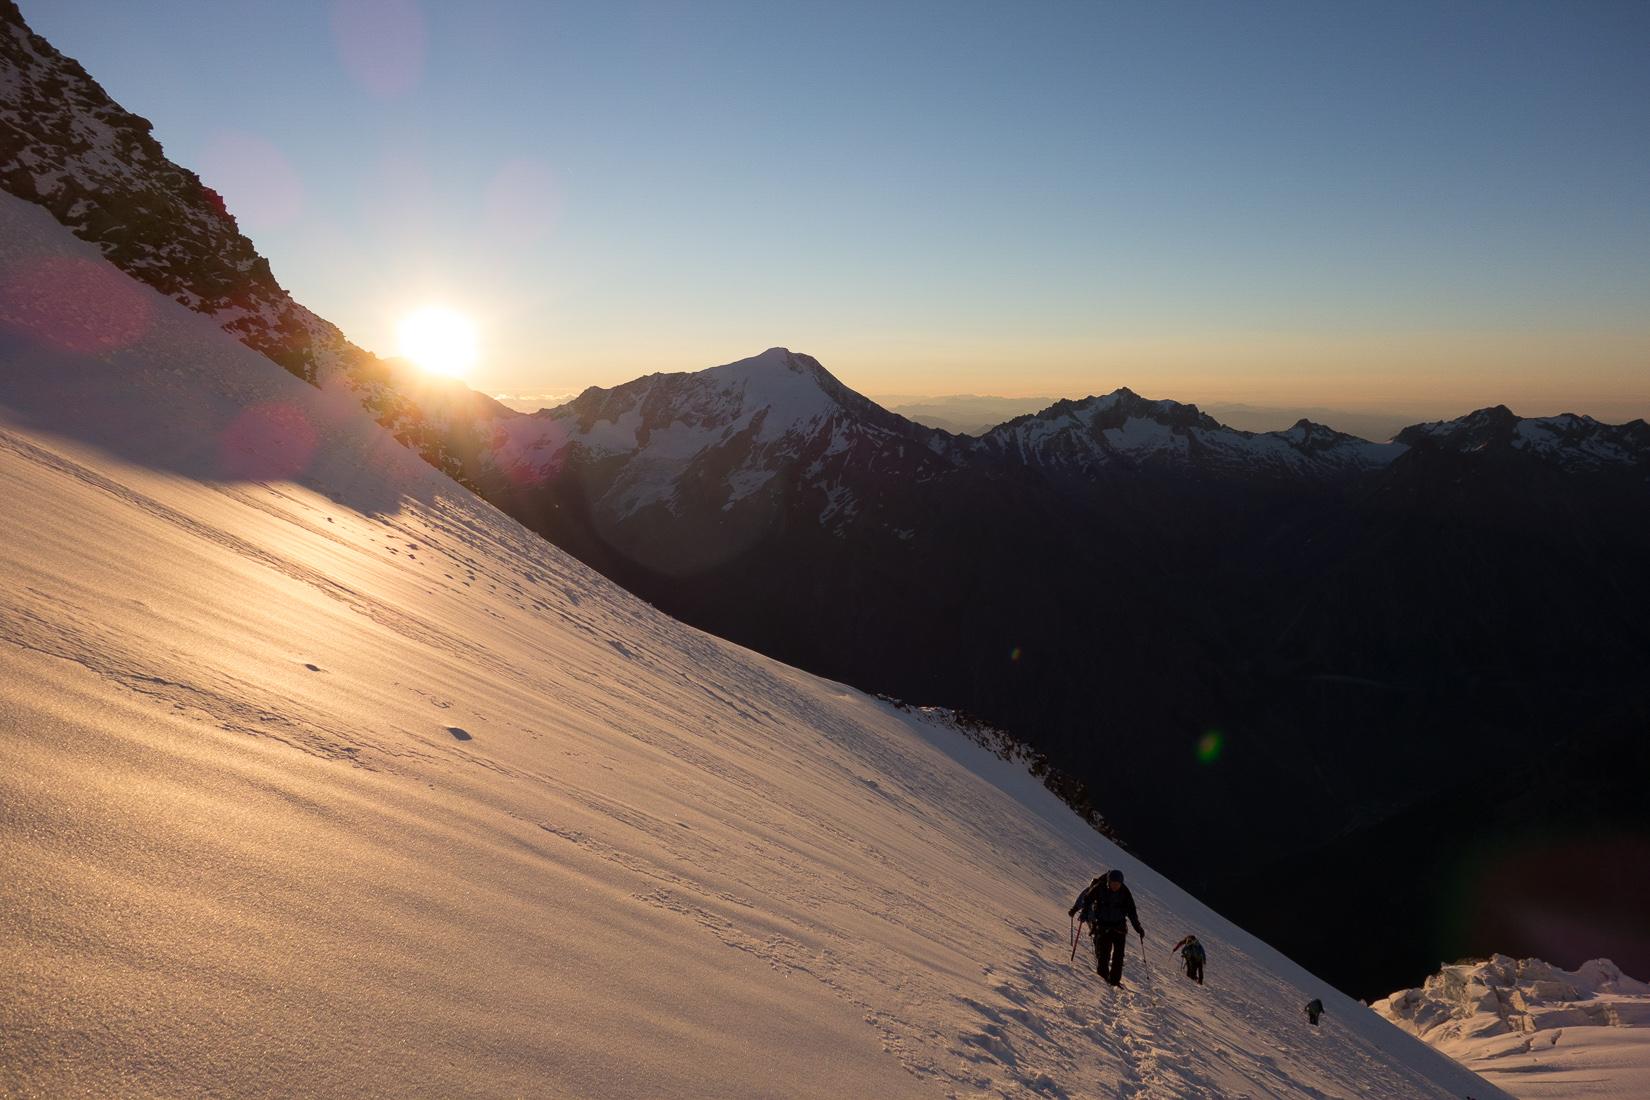 Sunrise approaching the Windjoch